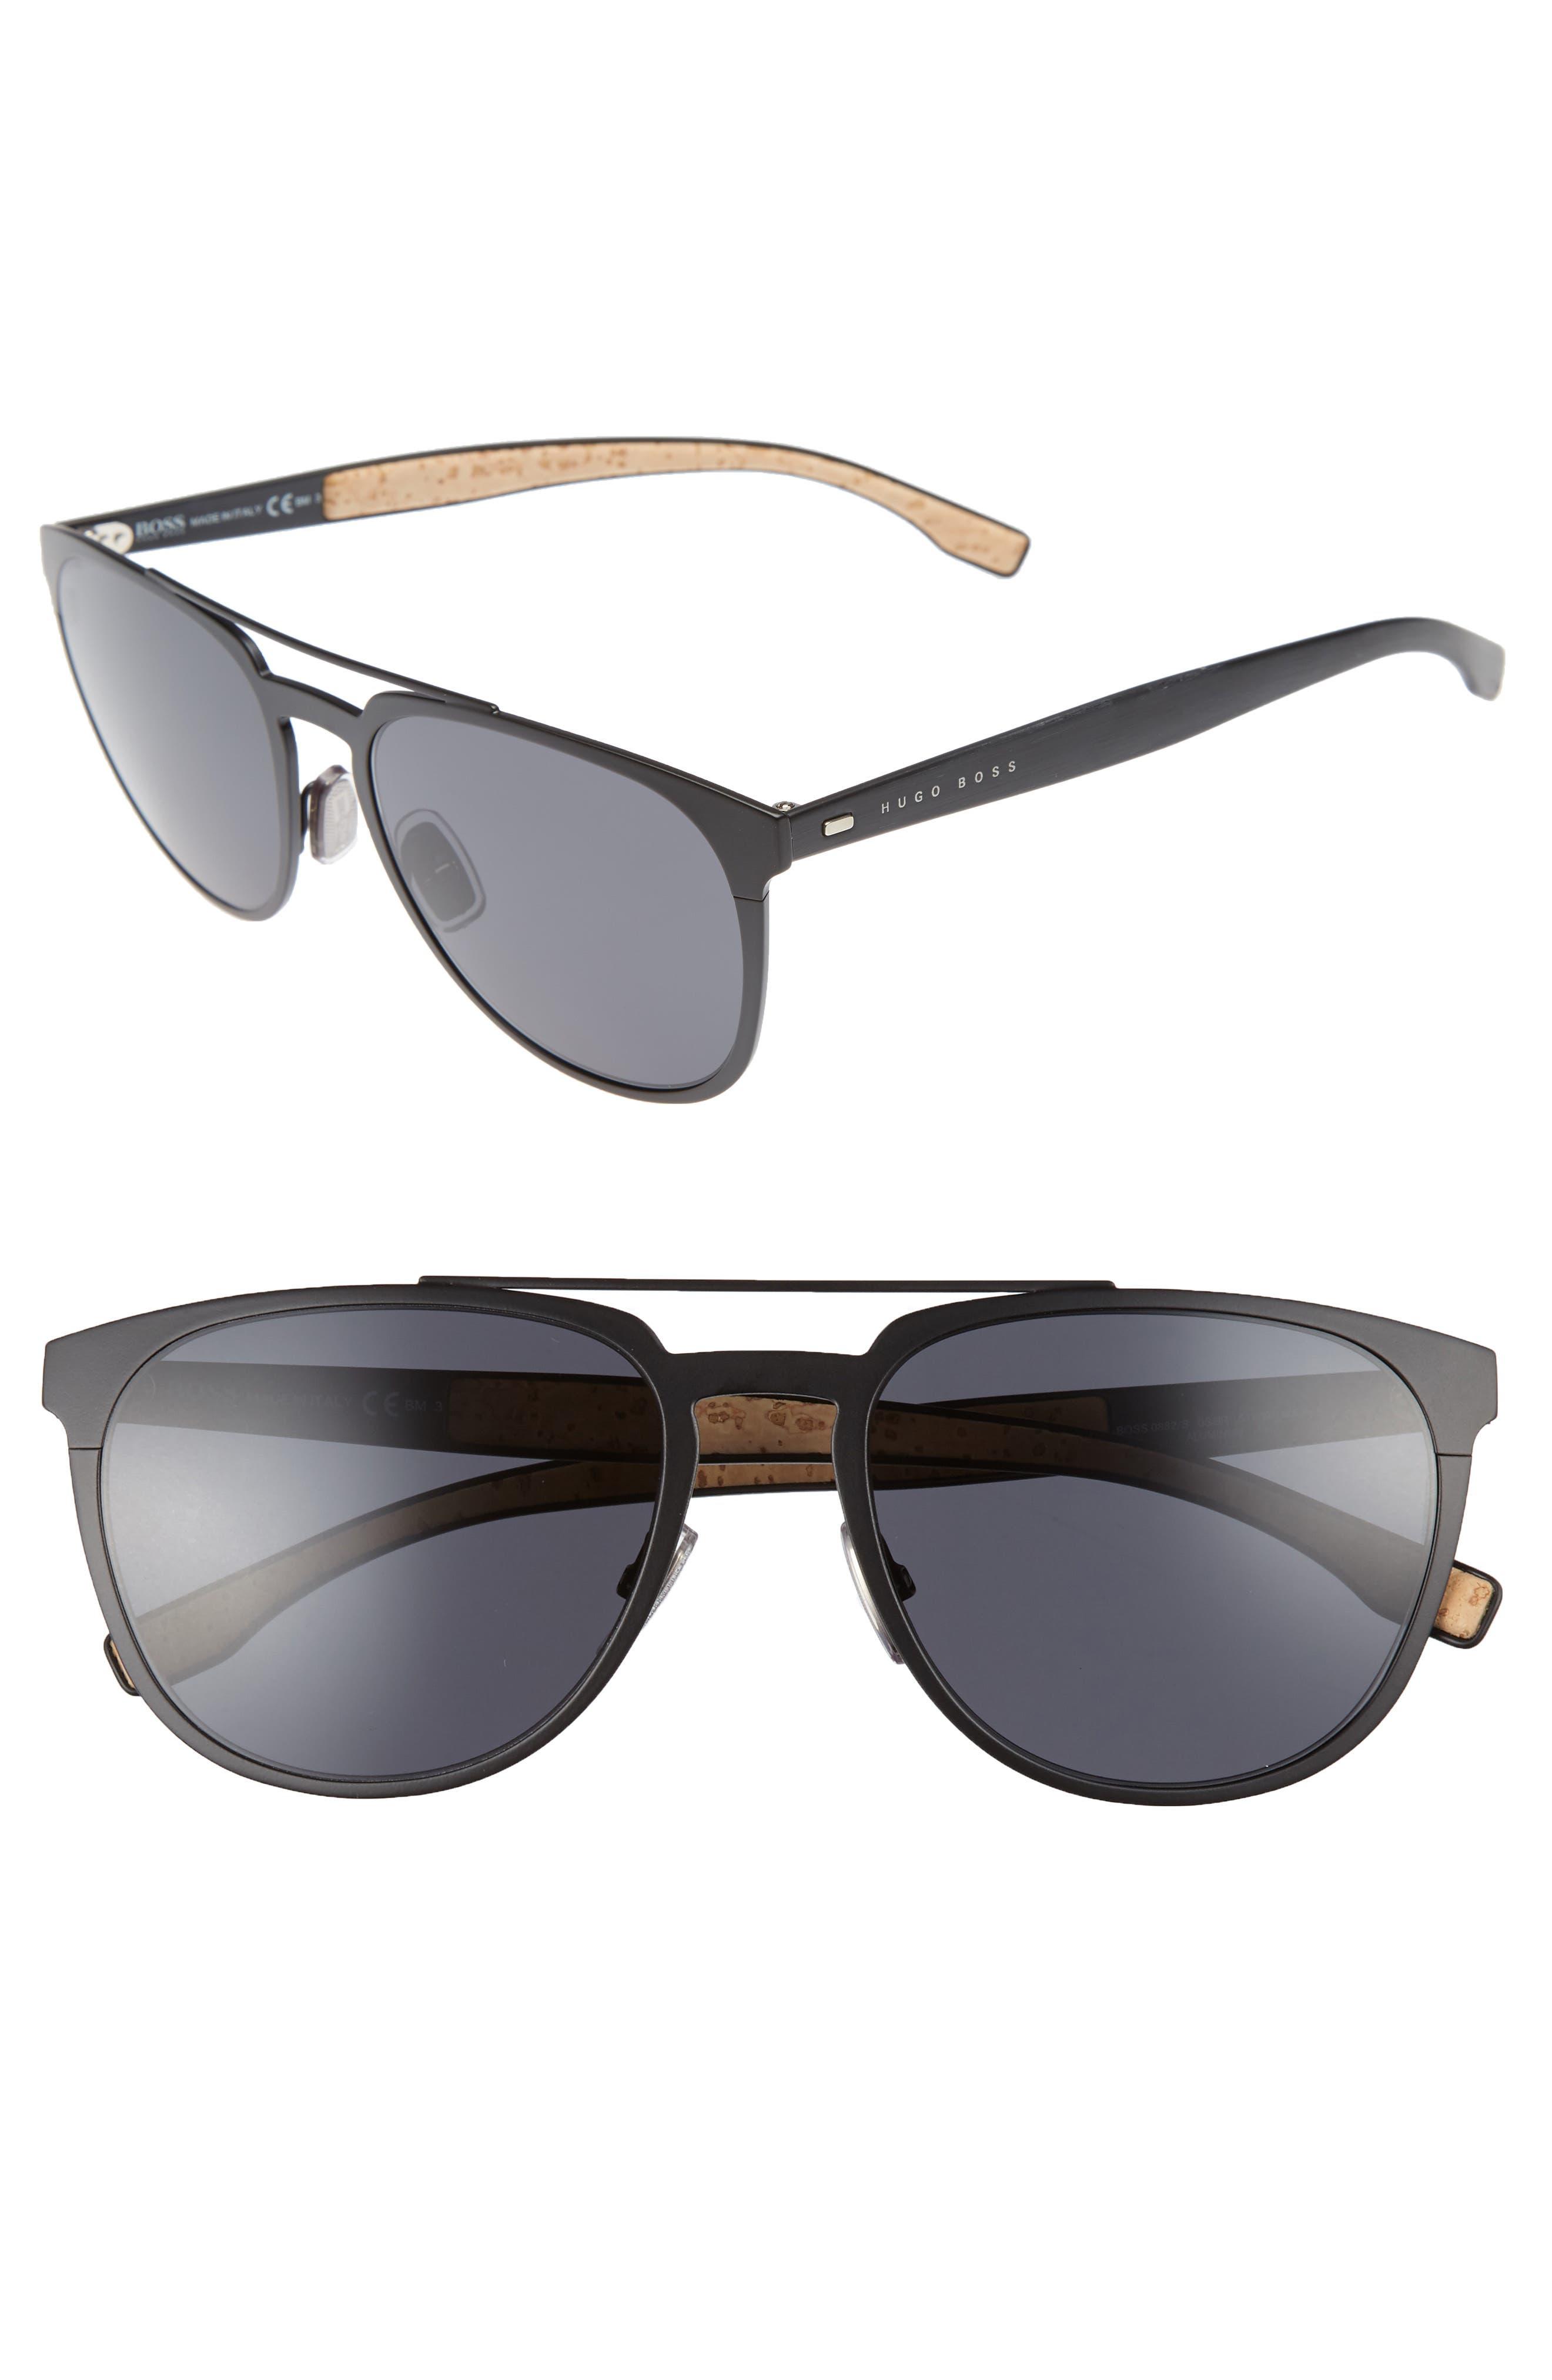 57mm Navigator Sunglasses,                             Main thumbnail 1, color,                             Matte Black/ Grey Blue